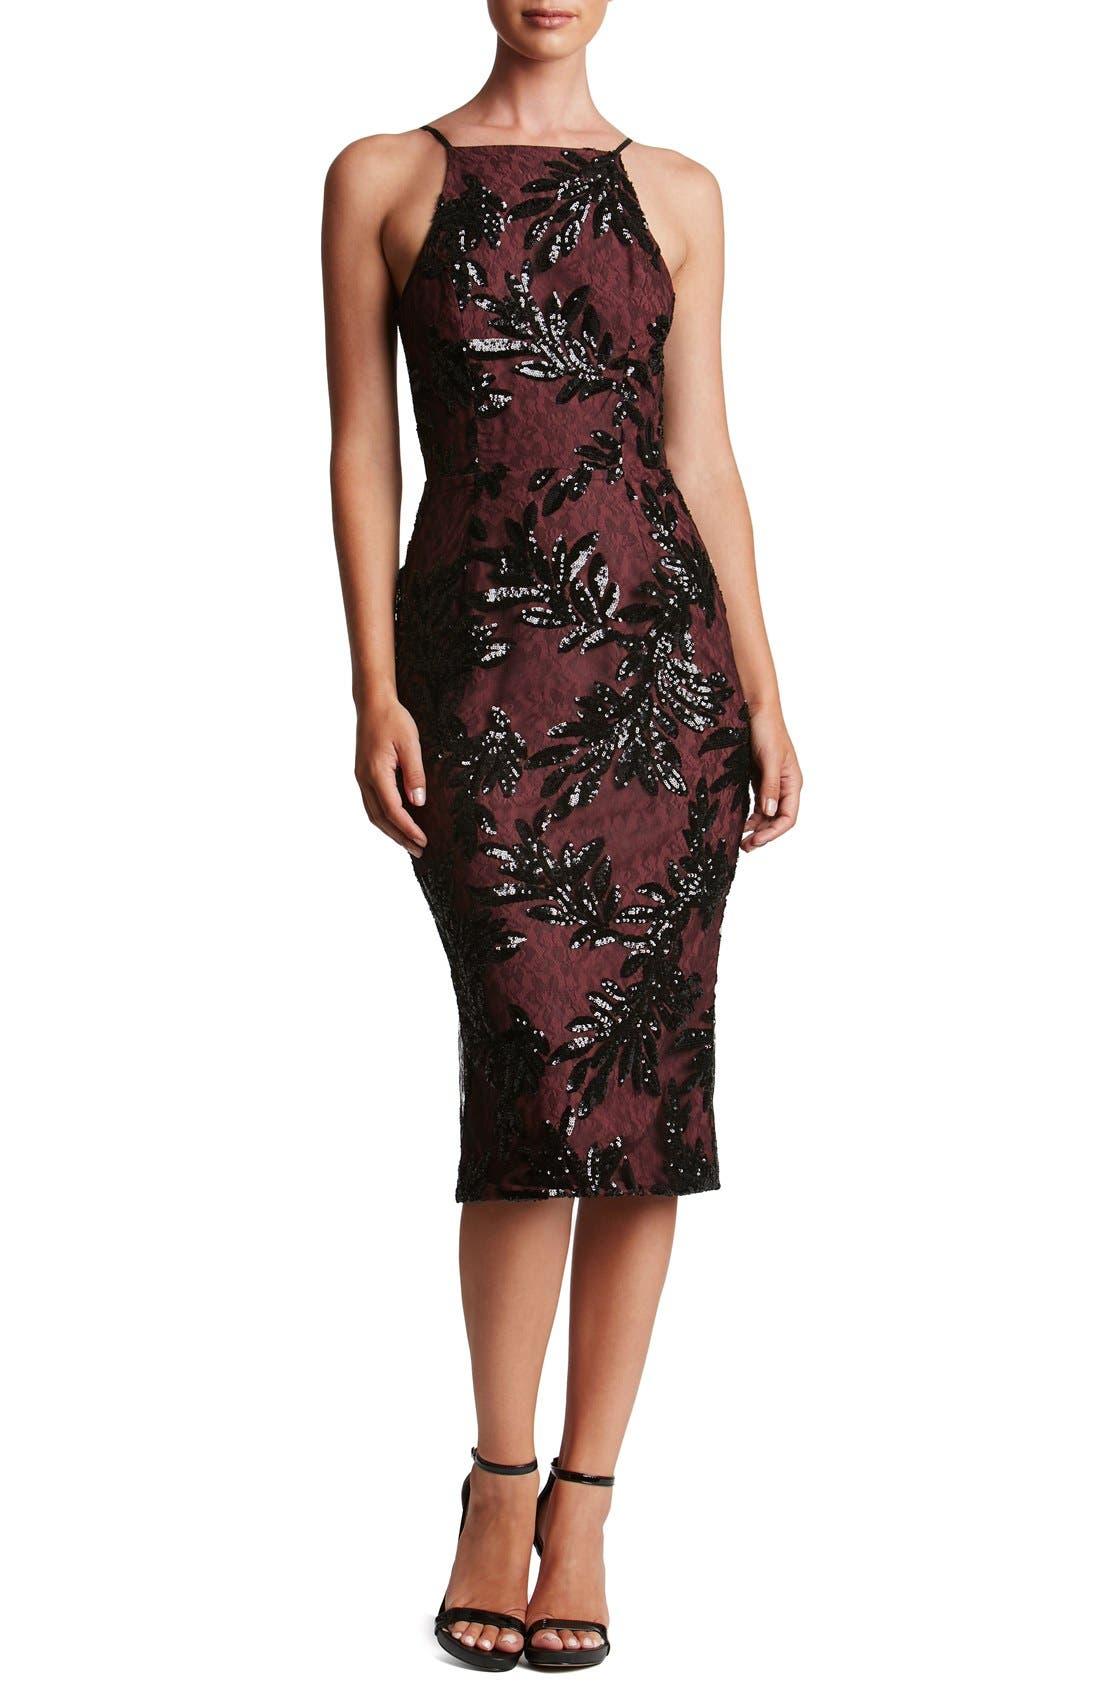 Alternate Image 1 Selected - Dress the Population Ashley Sequin Lace Sheath Dress